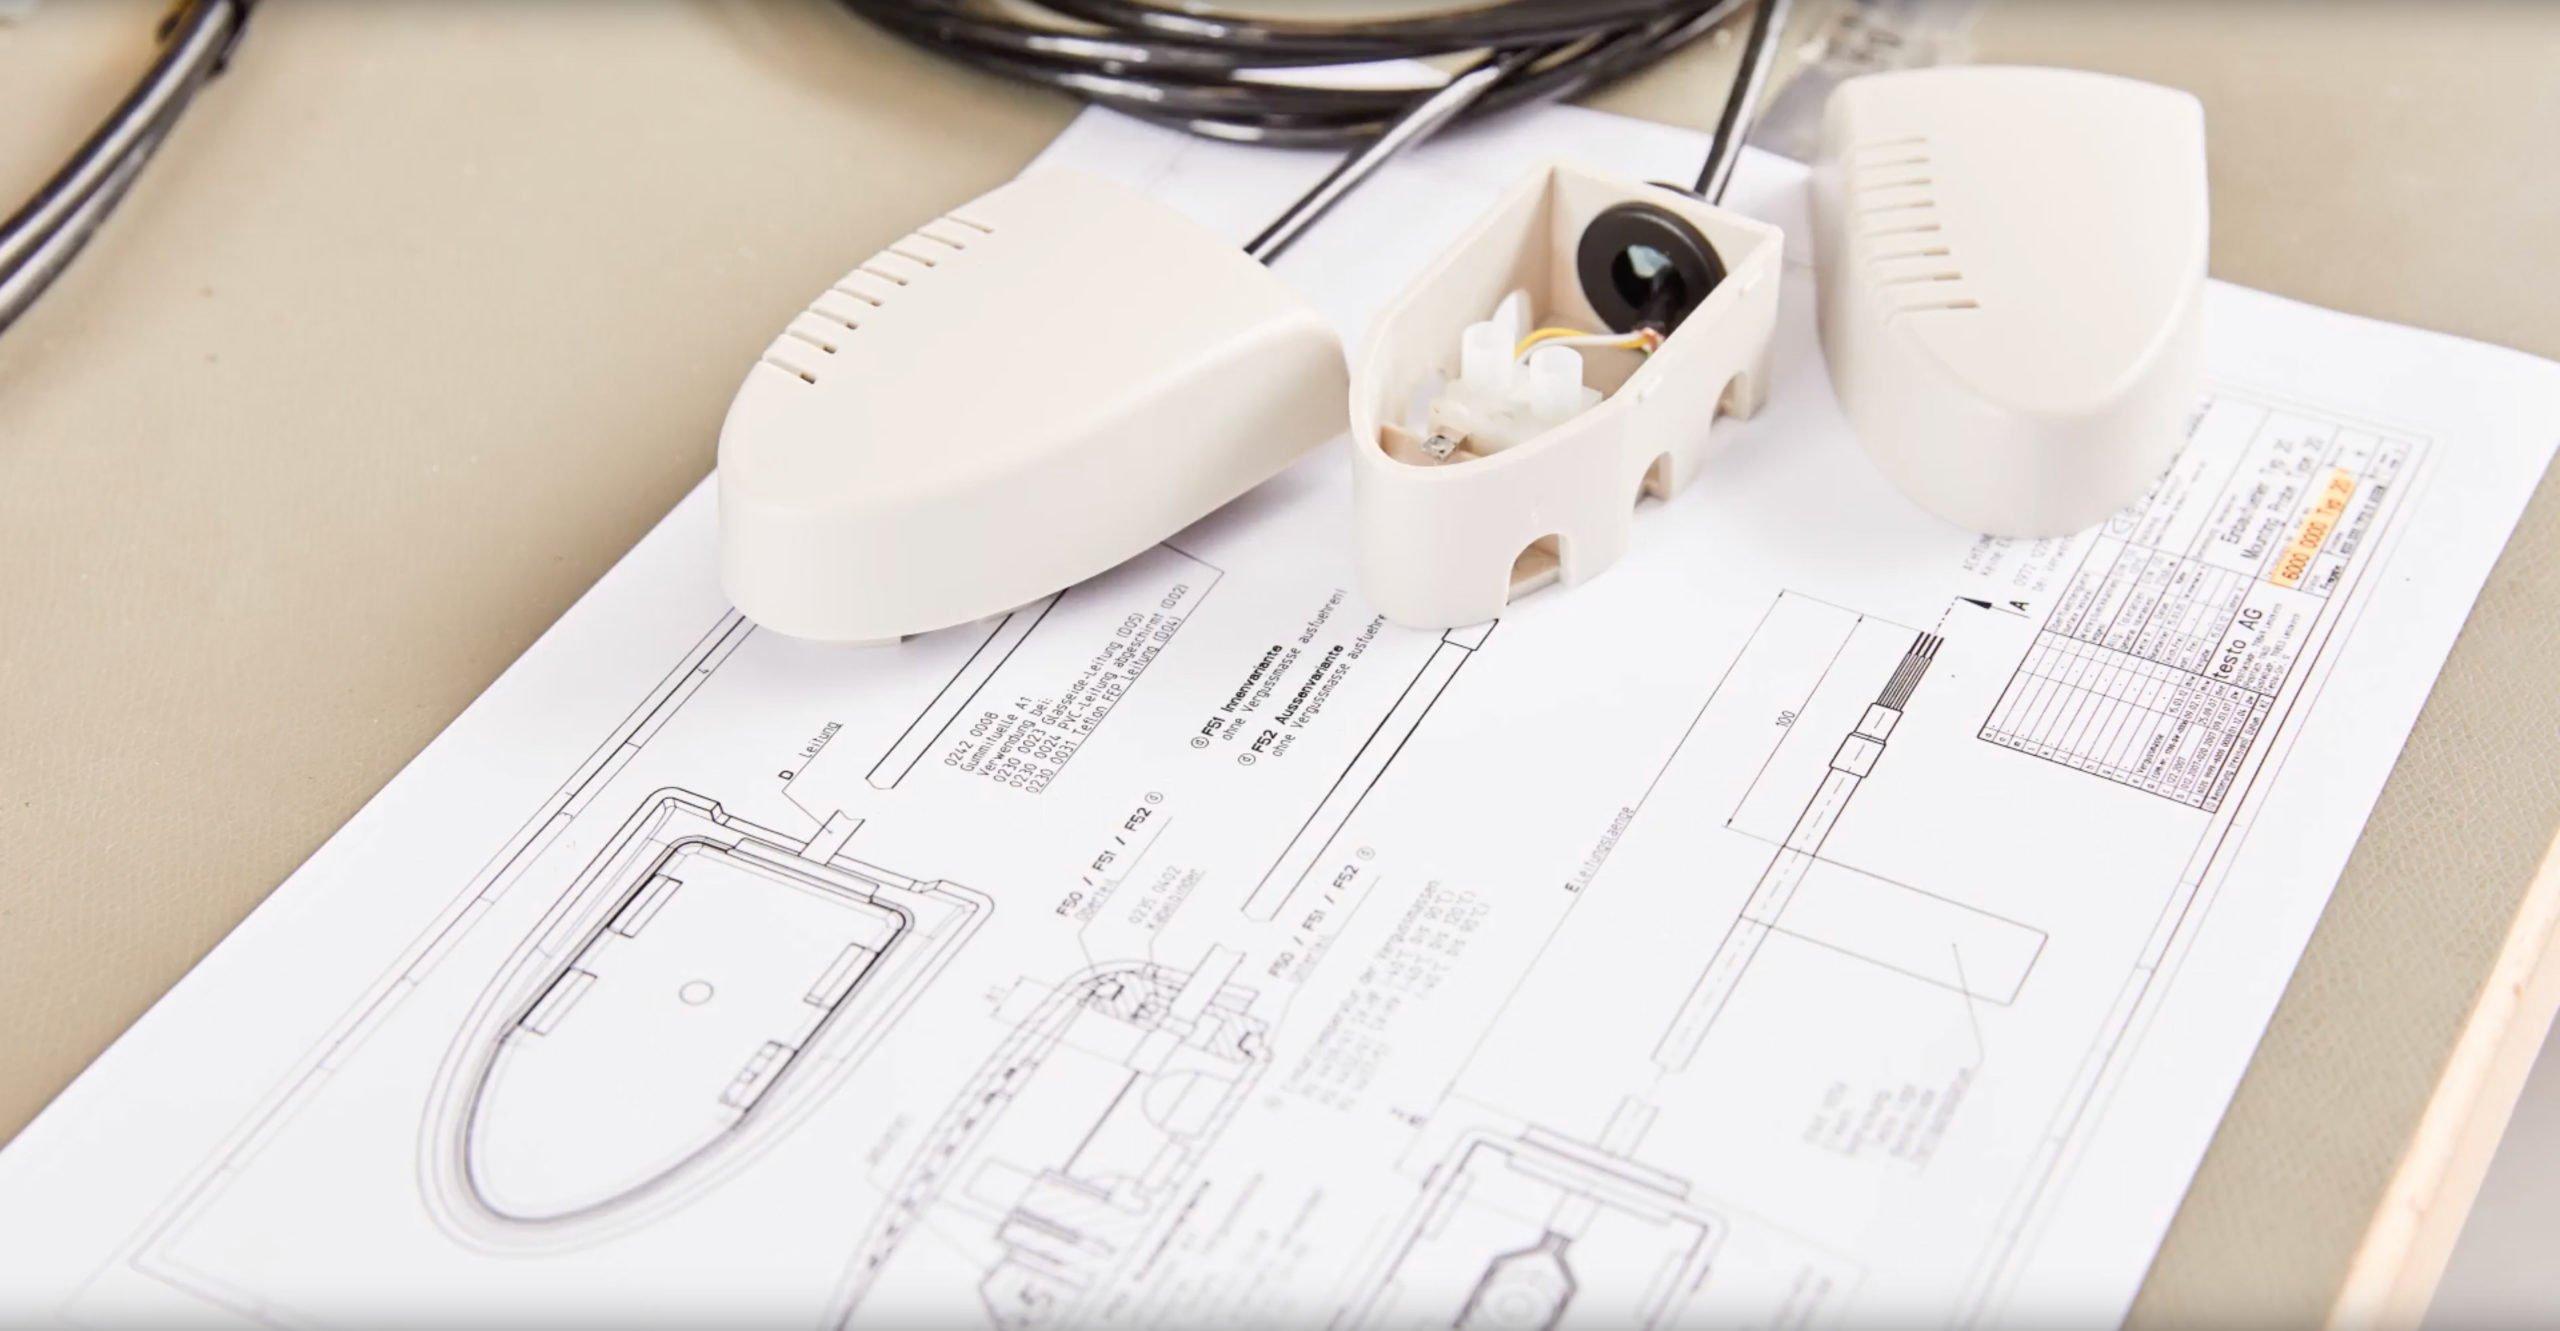 Muster-und Prototypenbau Lenzkirch Testo Sensor GmbH